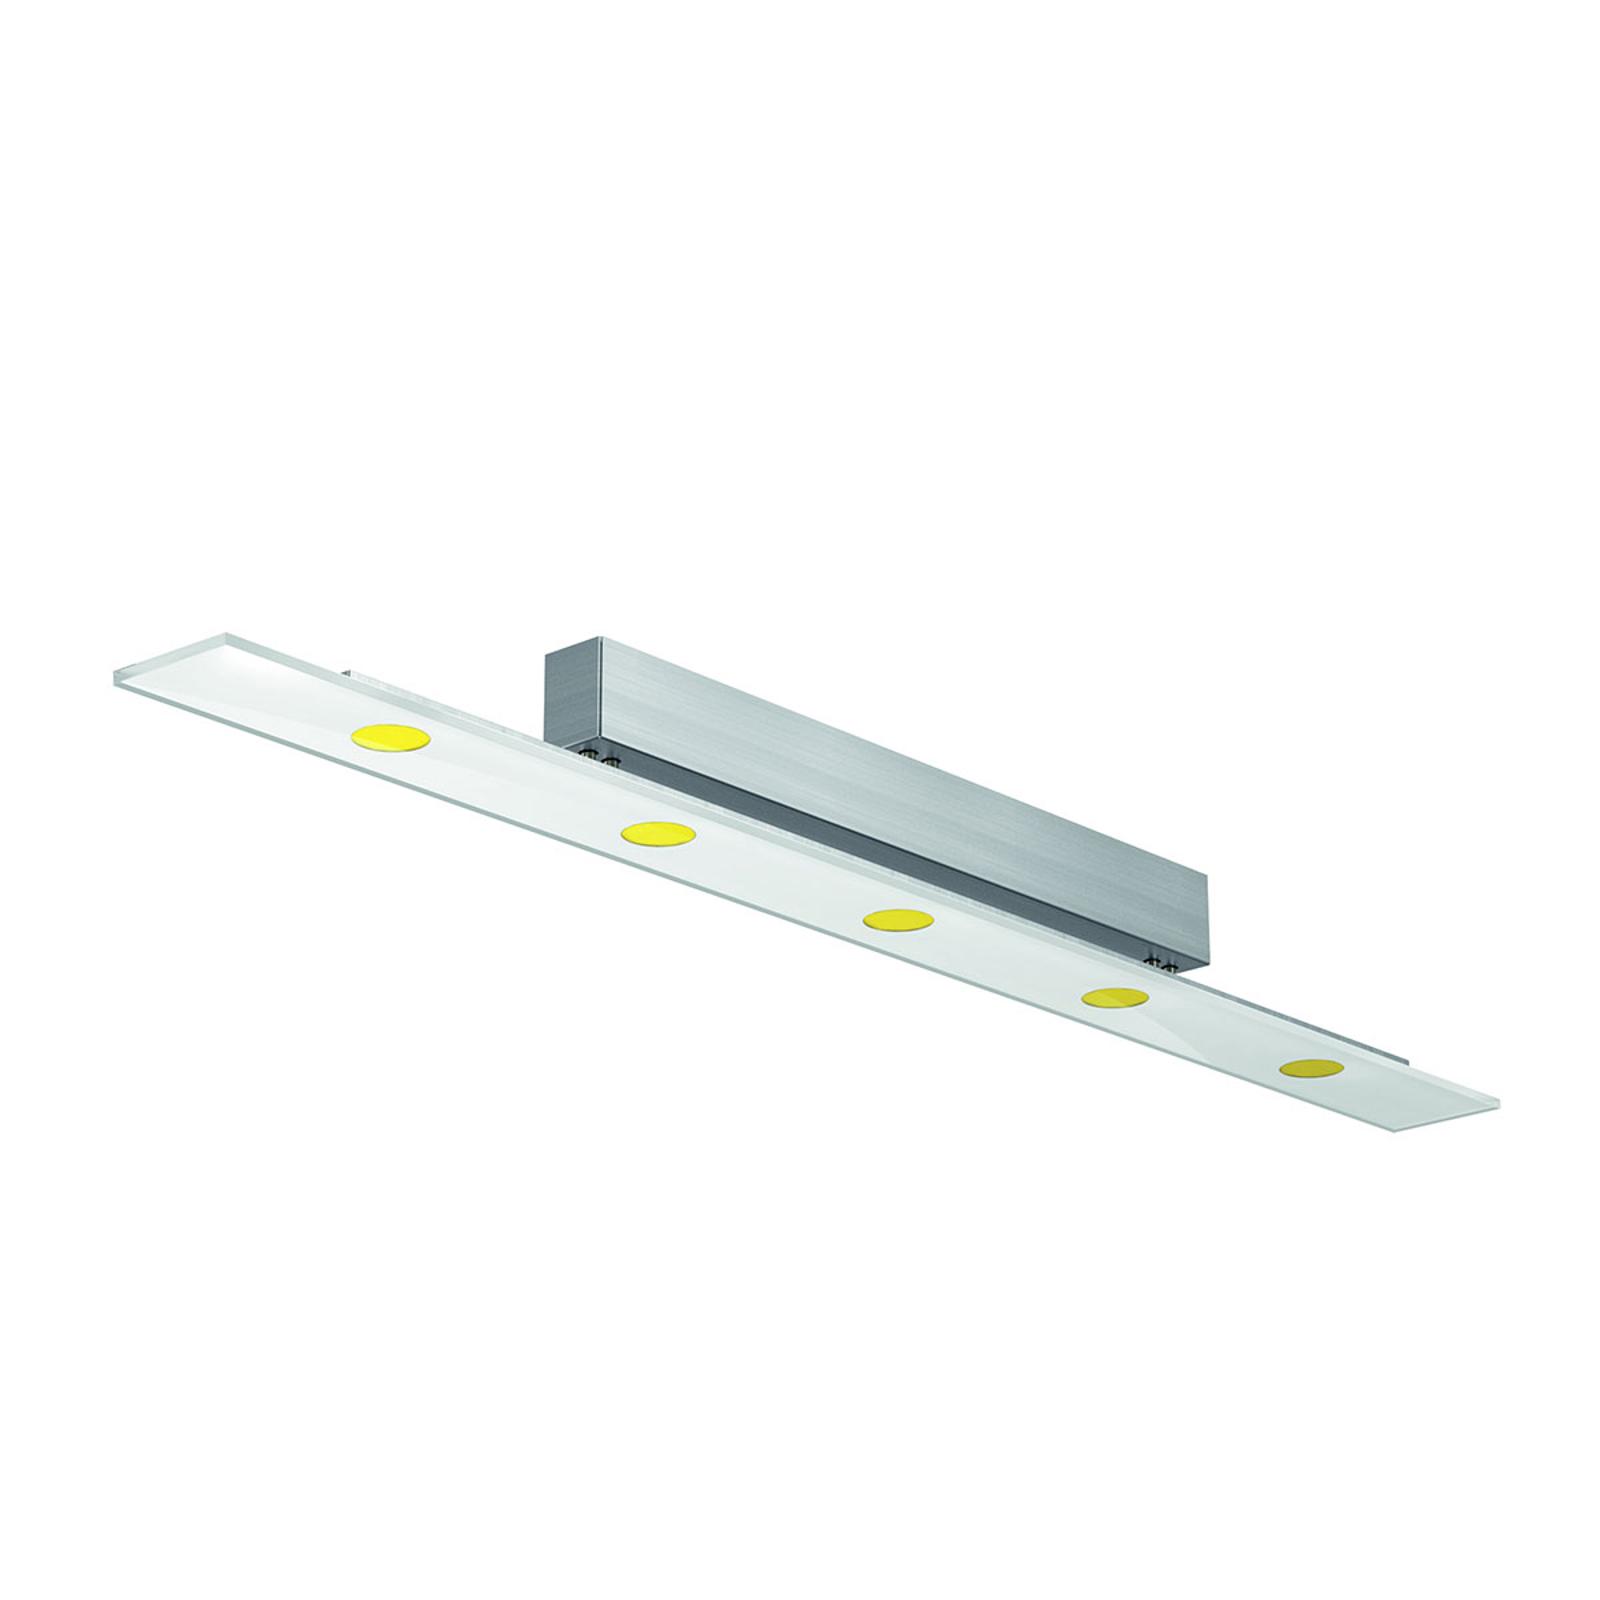 LED plafondlamp Sun met ESG-glas 110 cm